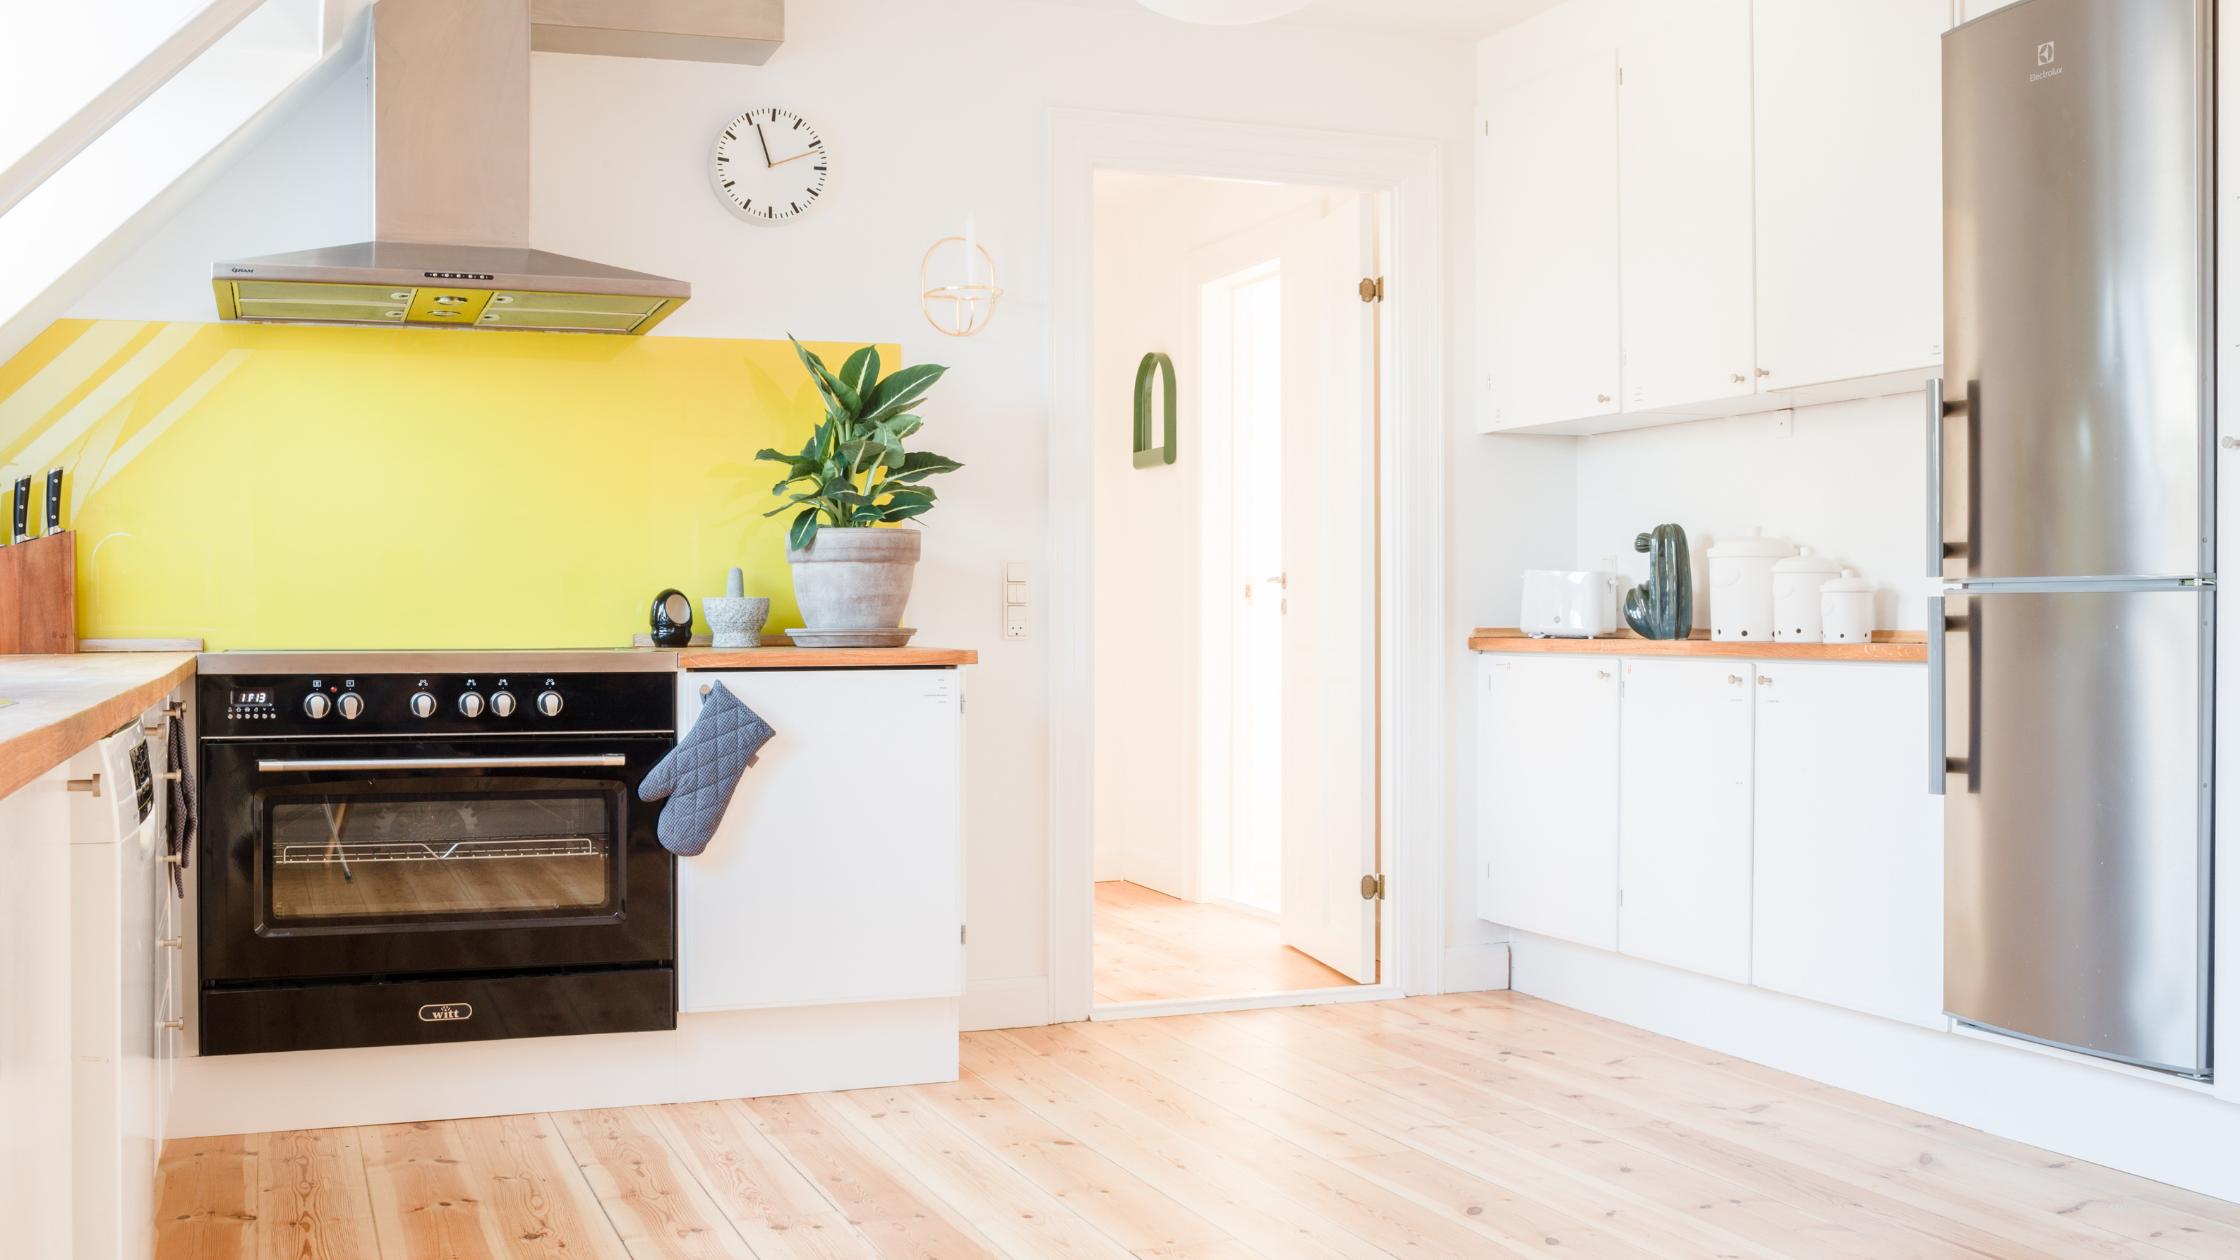 LifeX Home Kitchen